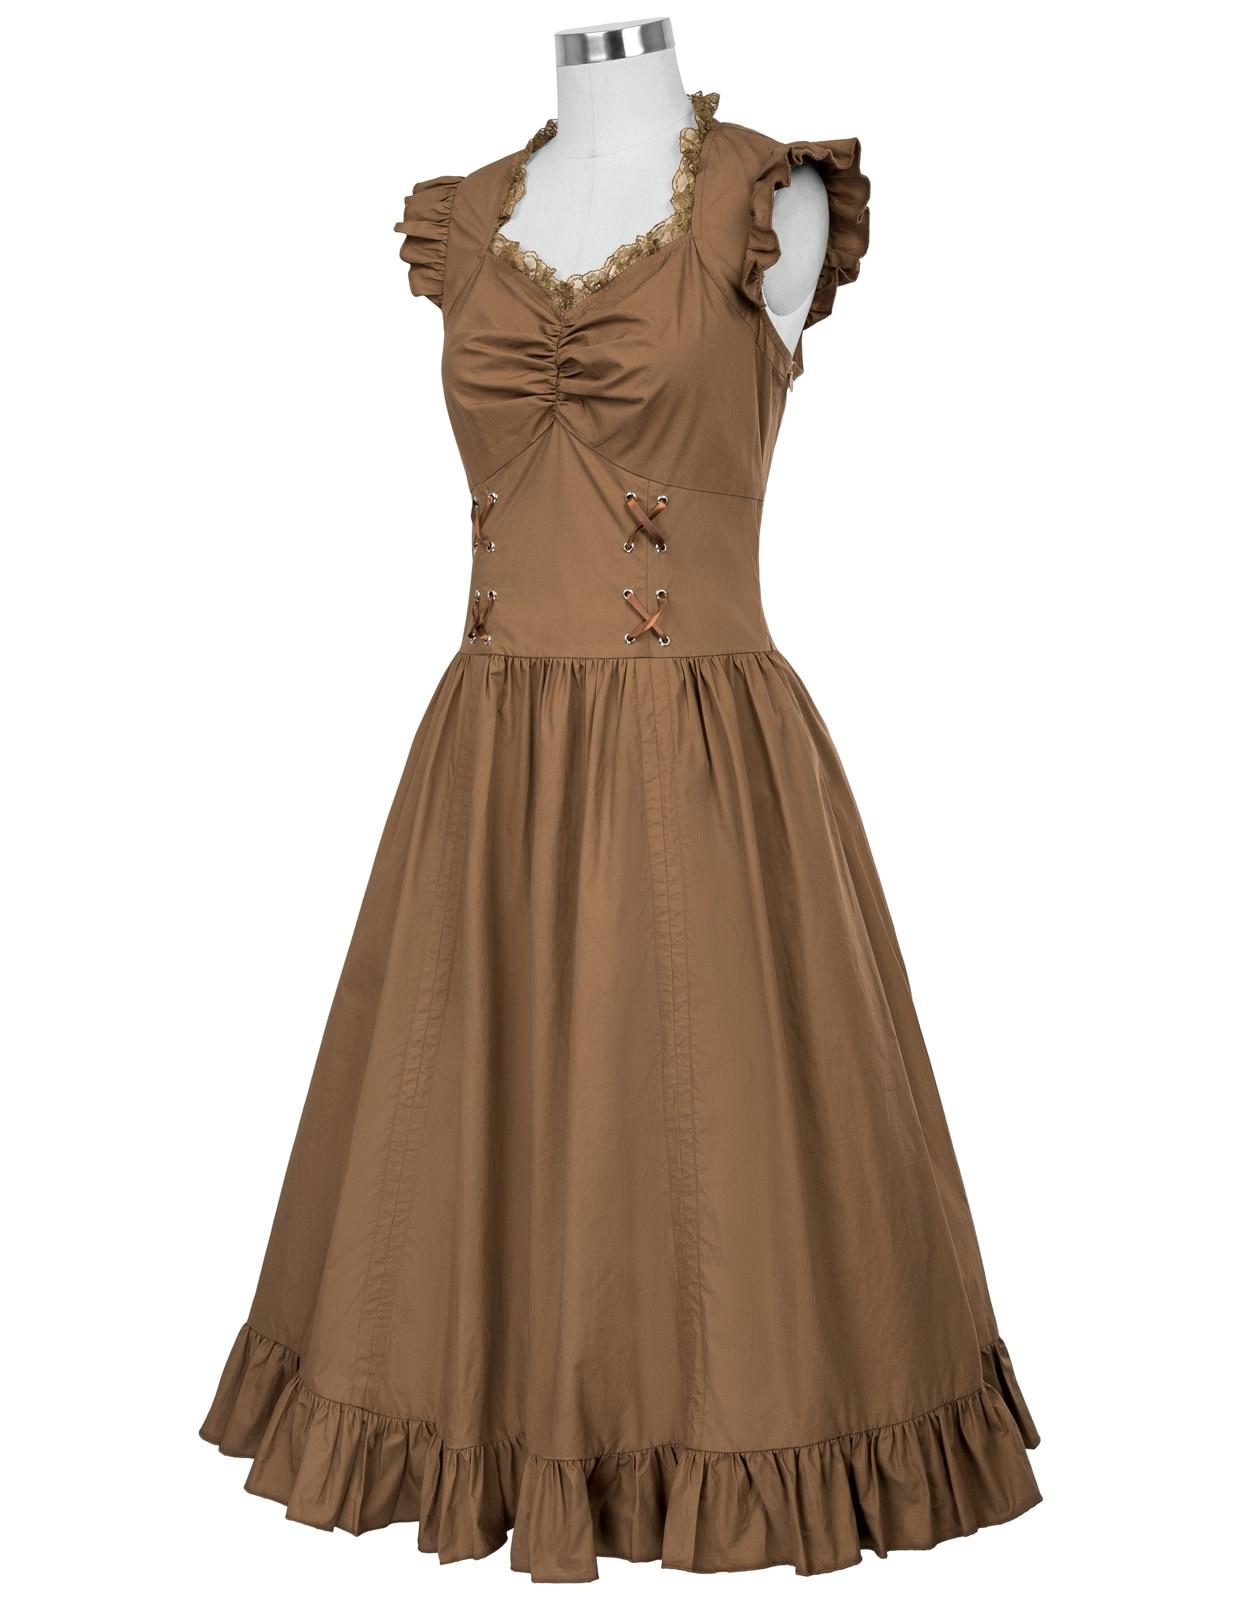 13583f88fb9 Women Sleeveless A-line Dress V-Neck Retro Vintage Black Gothic Victorian  Dress 1